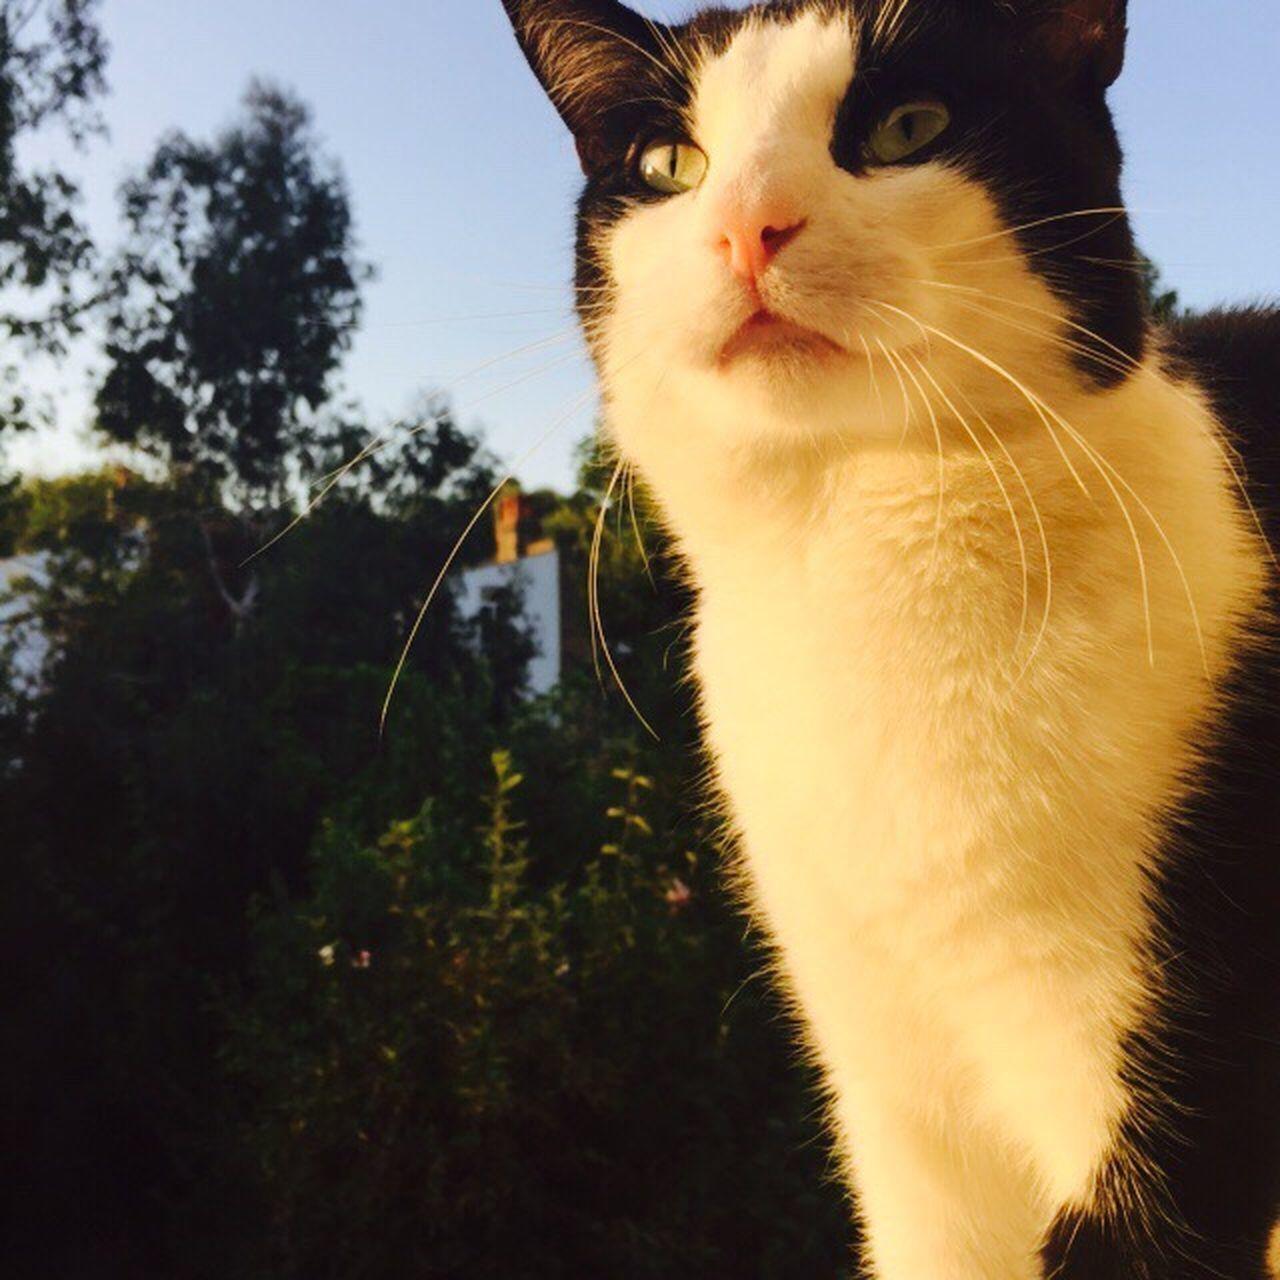 No edit, cat :) Pets Cat Feline Tree Close-up Blackandwhitecat Whisker Whiskers Clear Sky